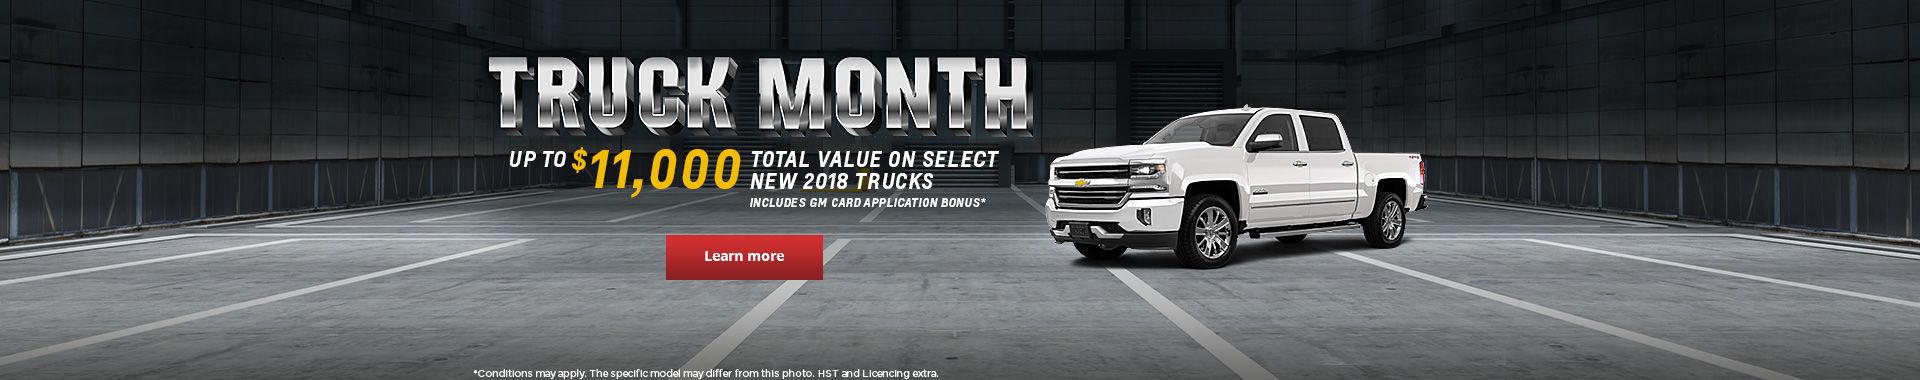 Truck Month - Chevrolet